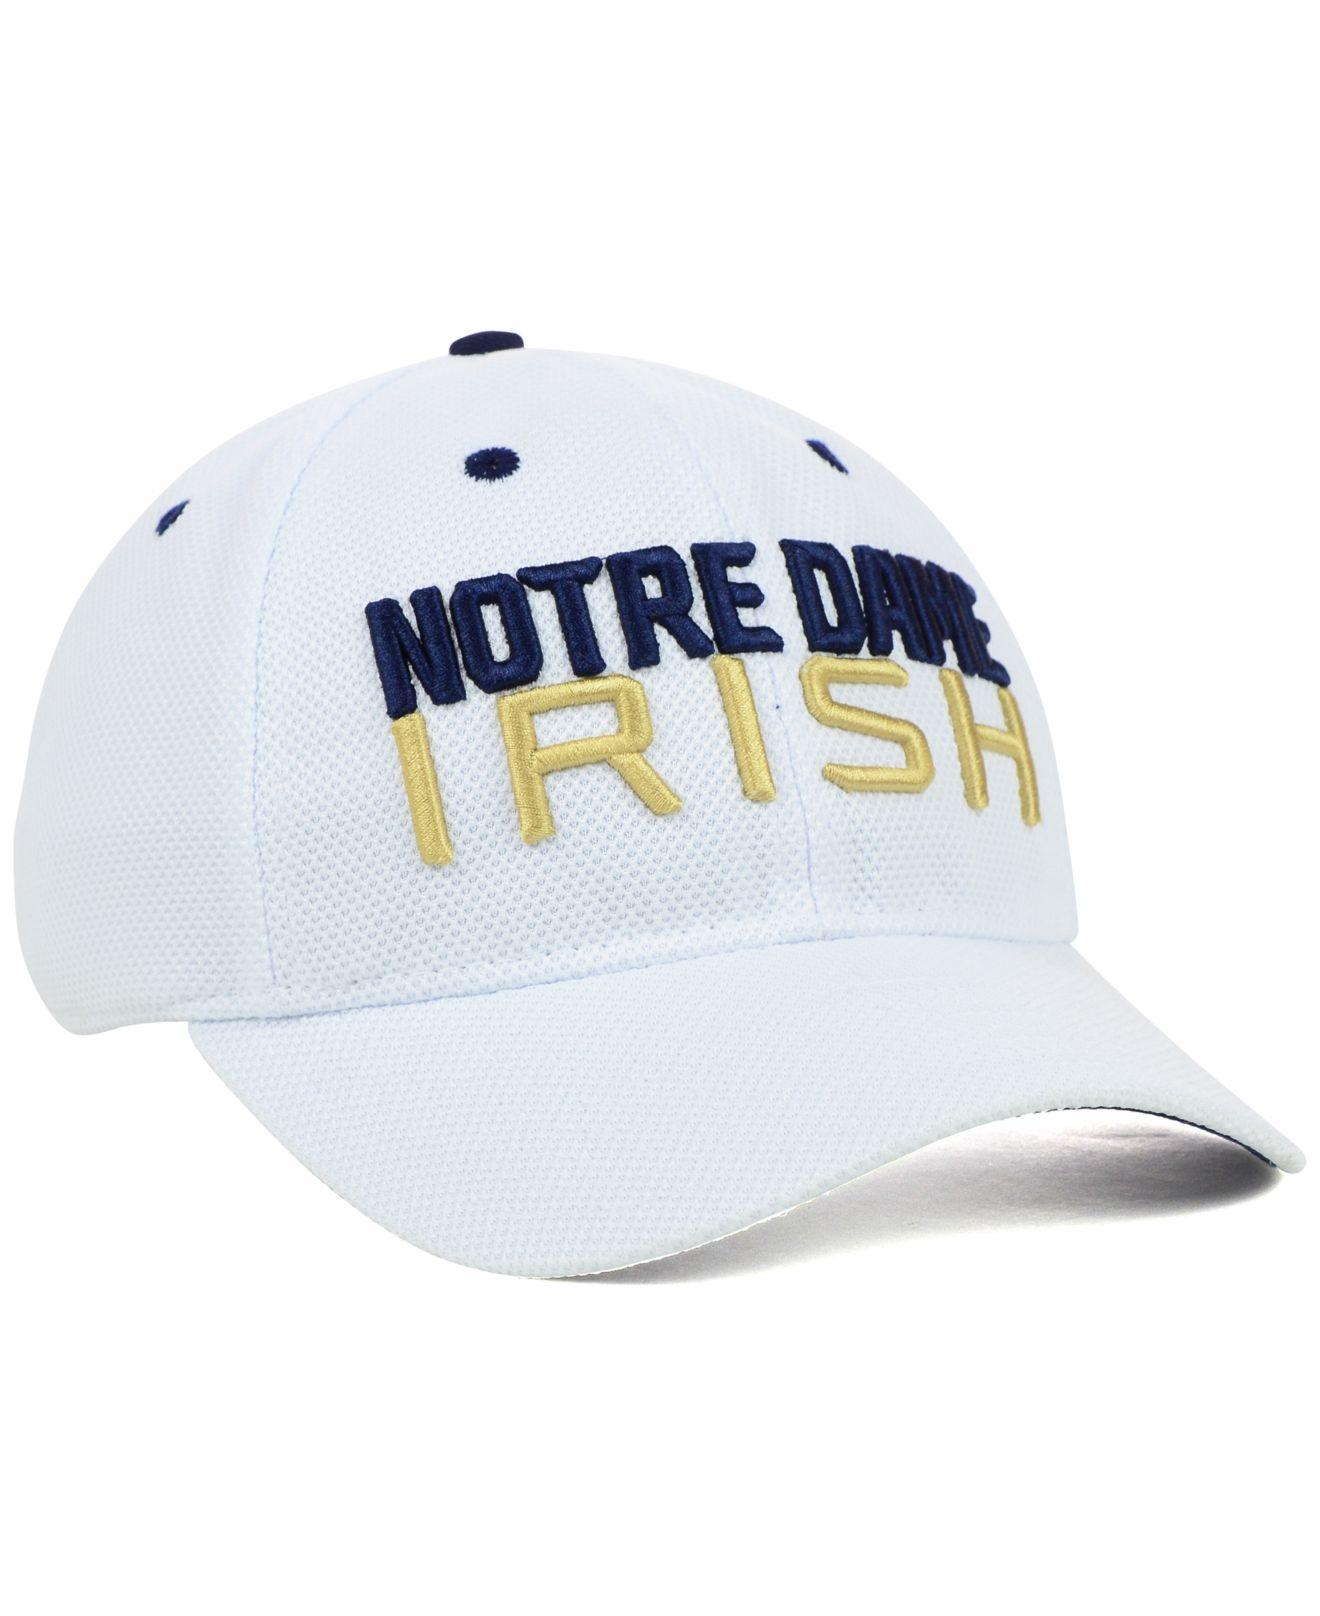 ... switzerland lyst adidas notre dame fighting irish campus slope flex cap  in bdd52 4e3e0 ba1bbb9d1e98